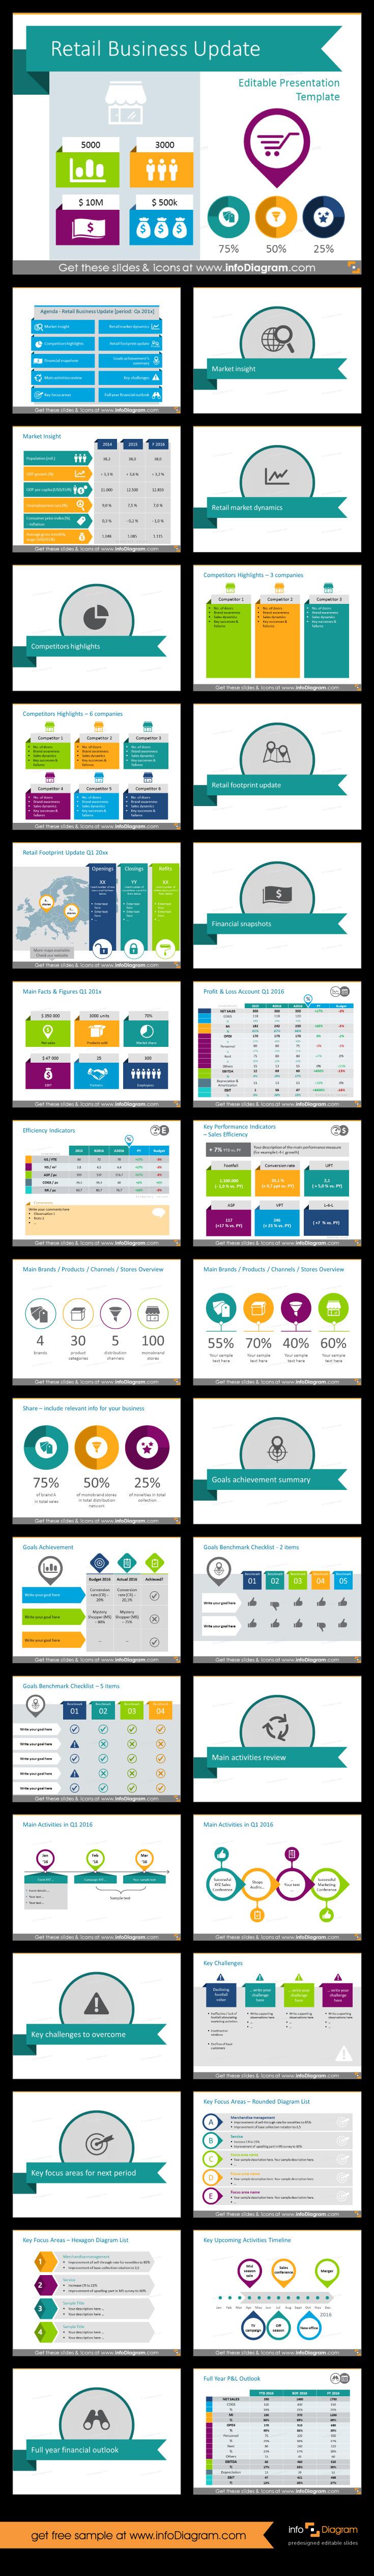 Retail business update review presentation template for showing retail business update review presentation template for showing summary of company events shops performance key toneelgroepblik Choice Image